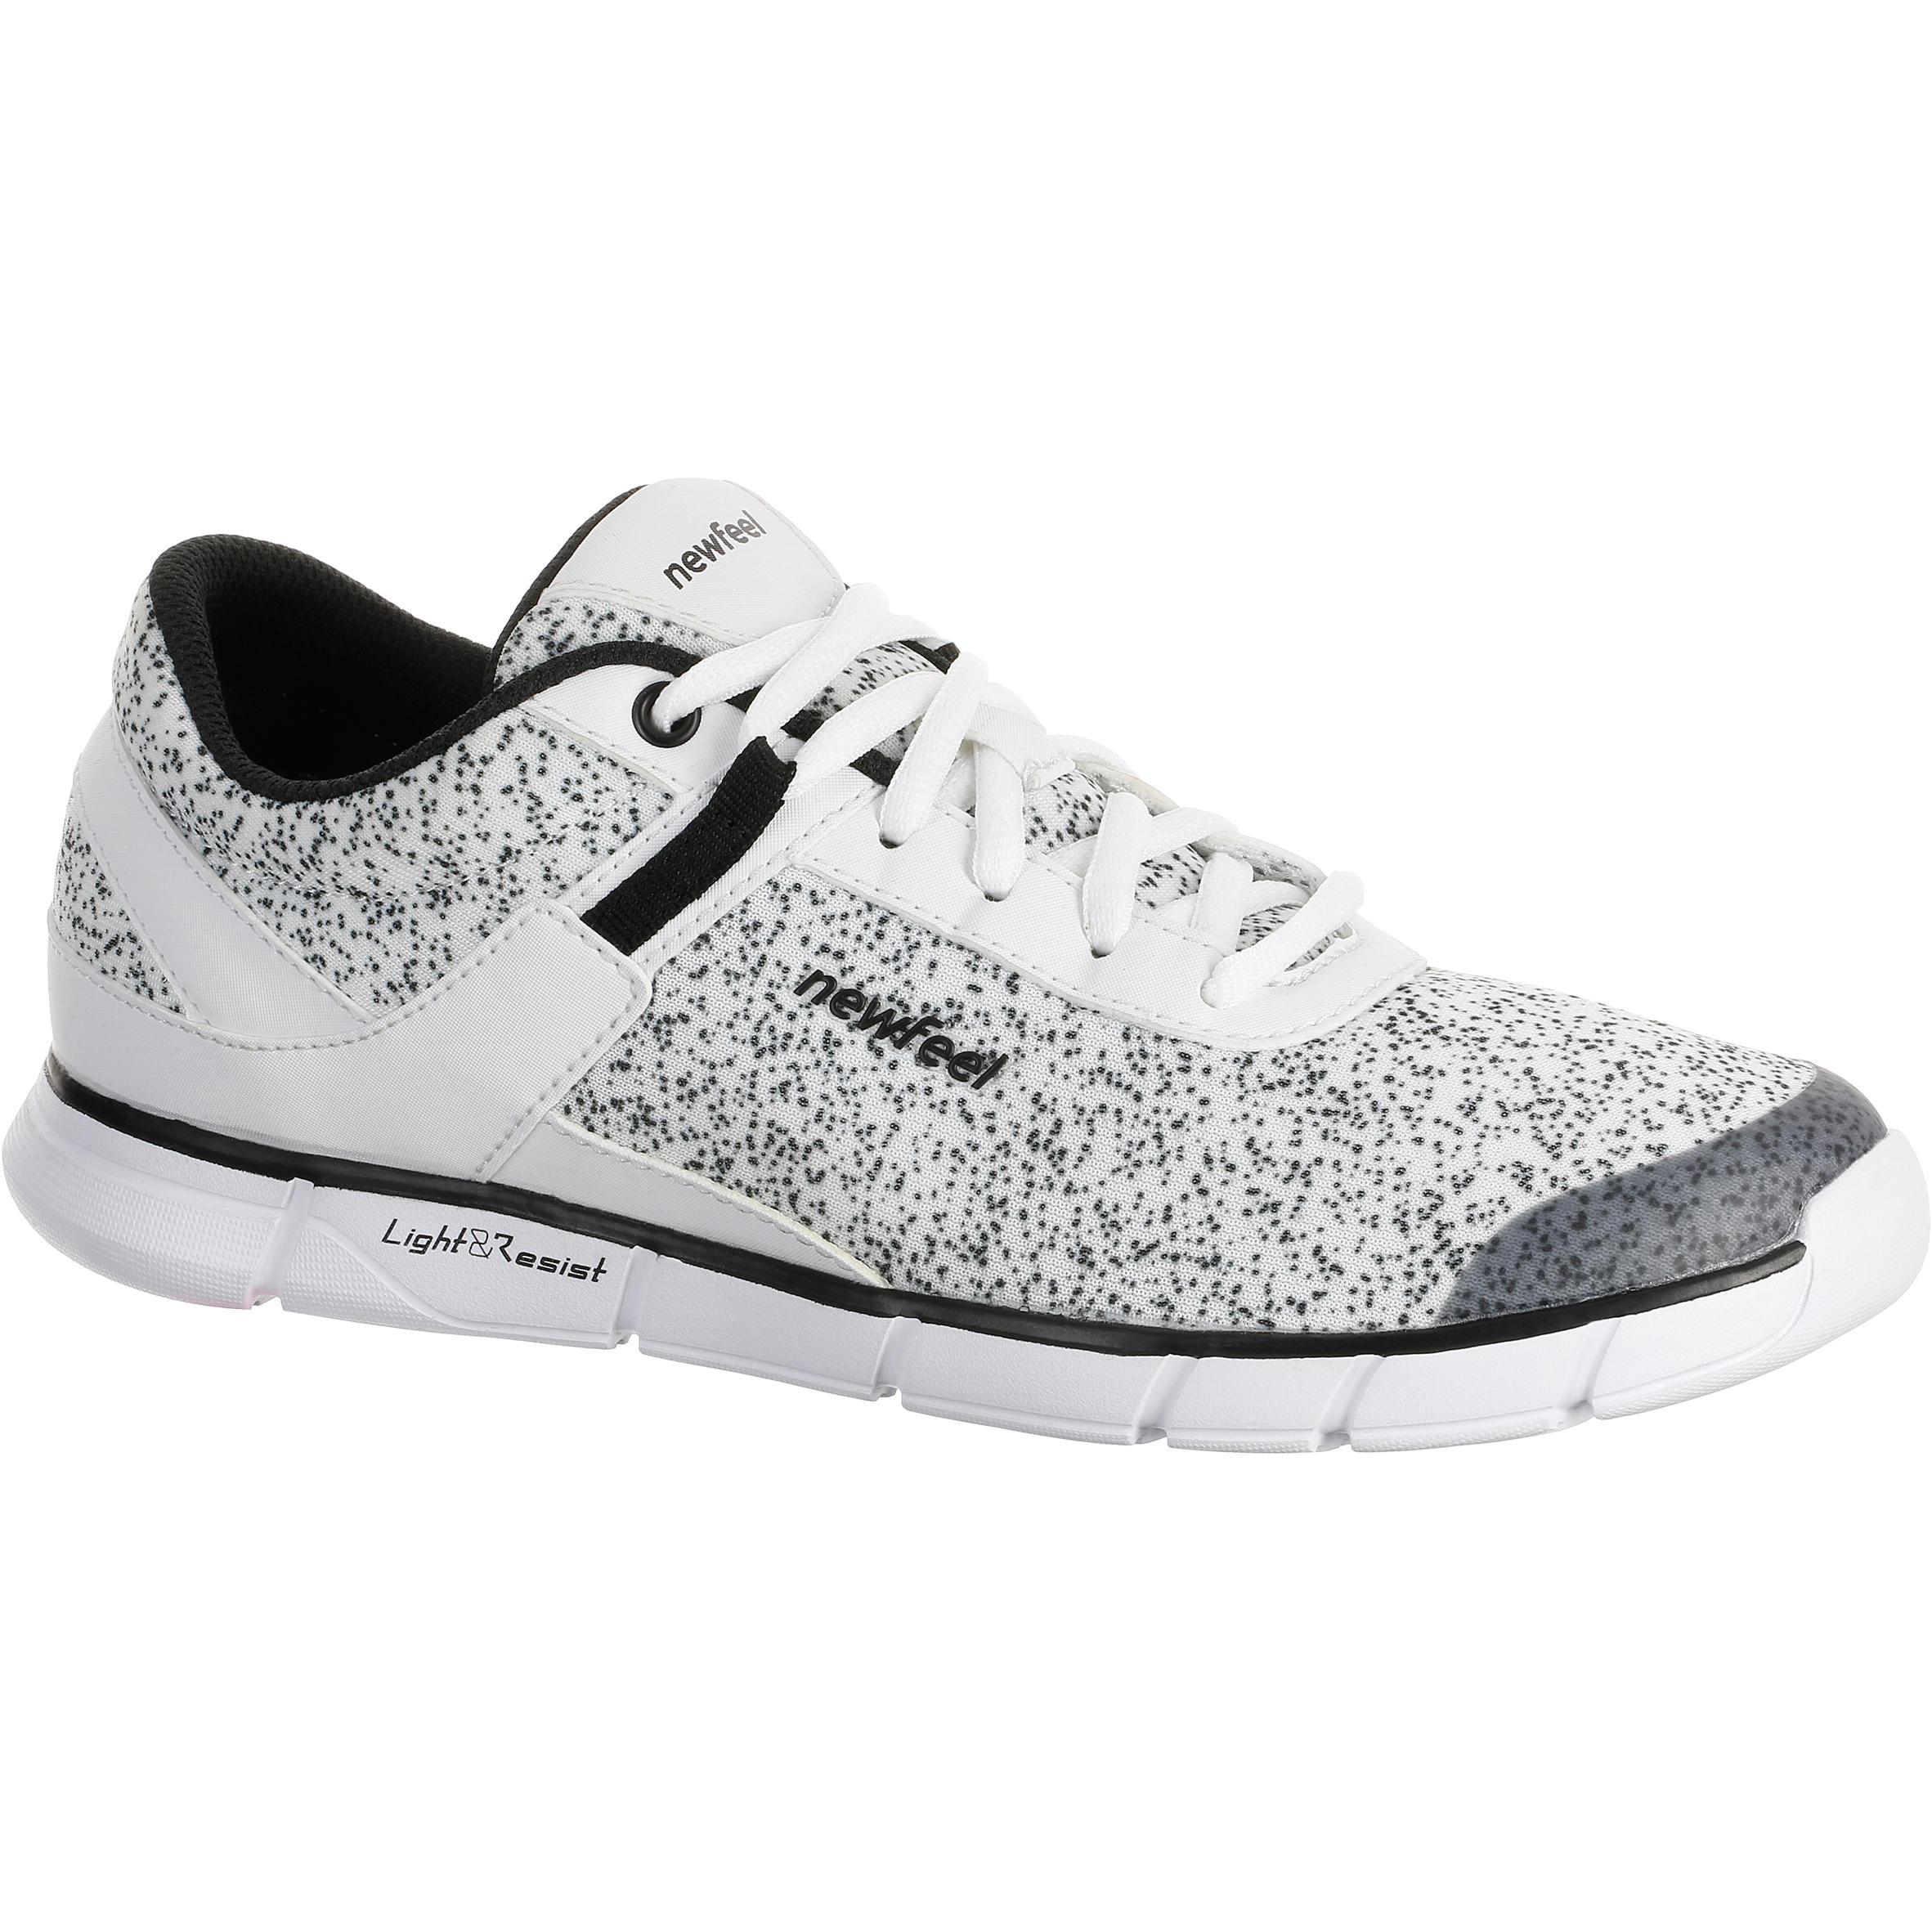 NEWFEEL Chaussures marche sportive femme Soft 540 blanc moucheté - NEWFEEL - 39